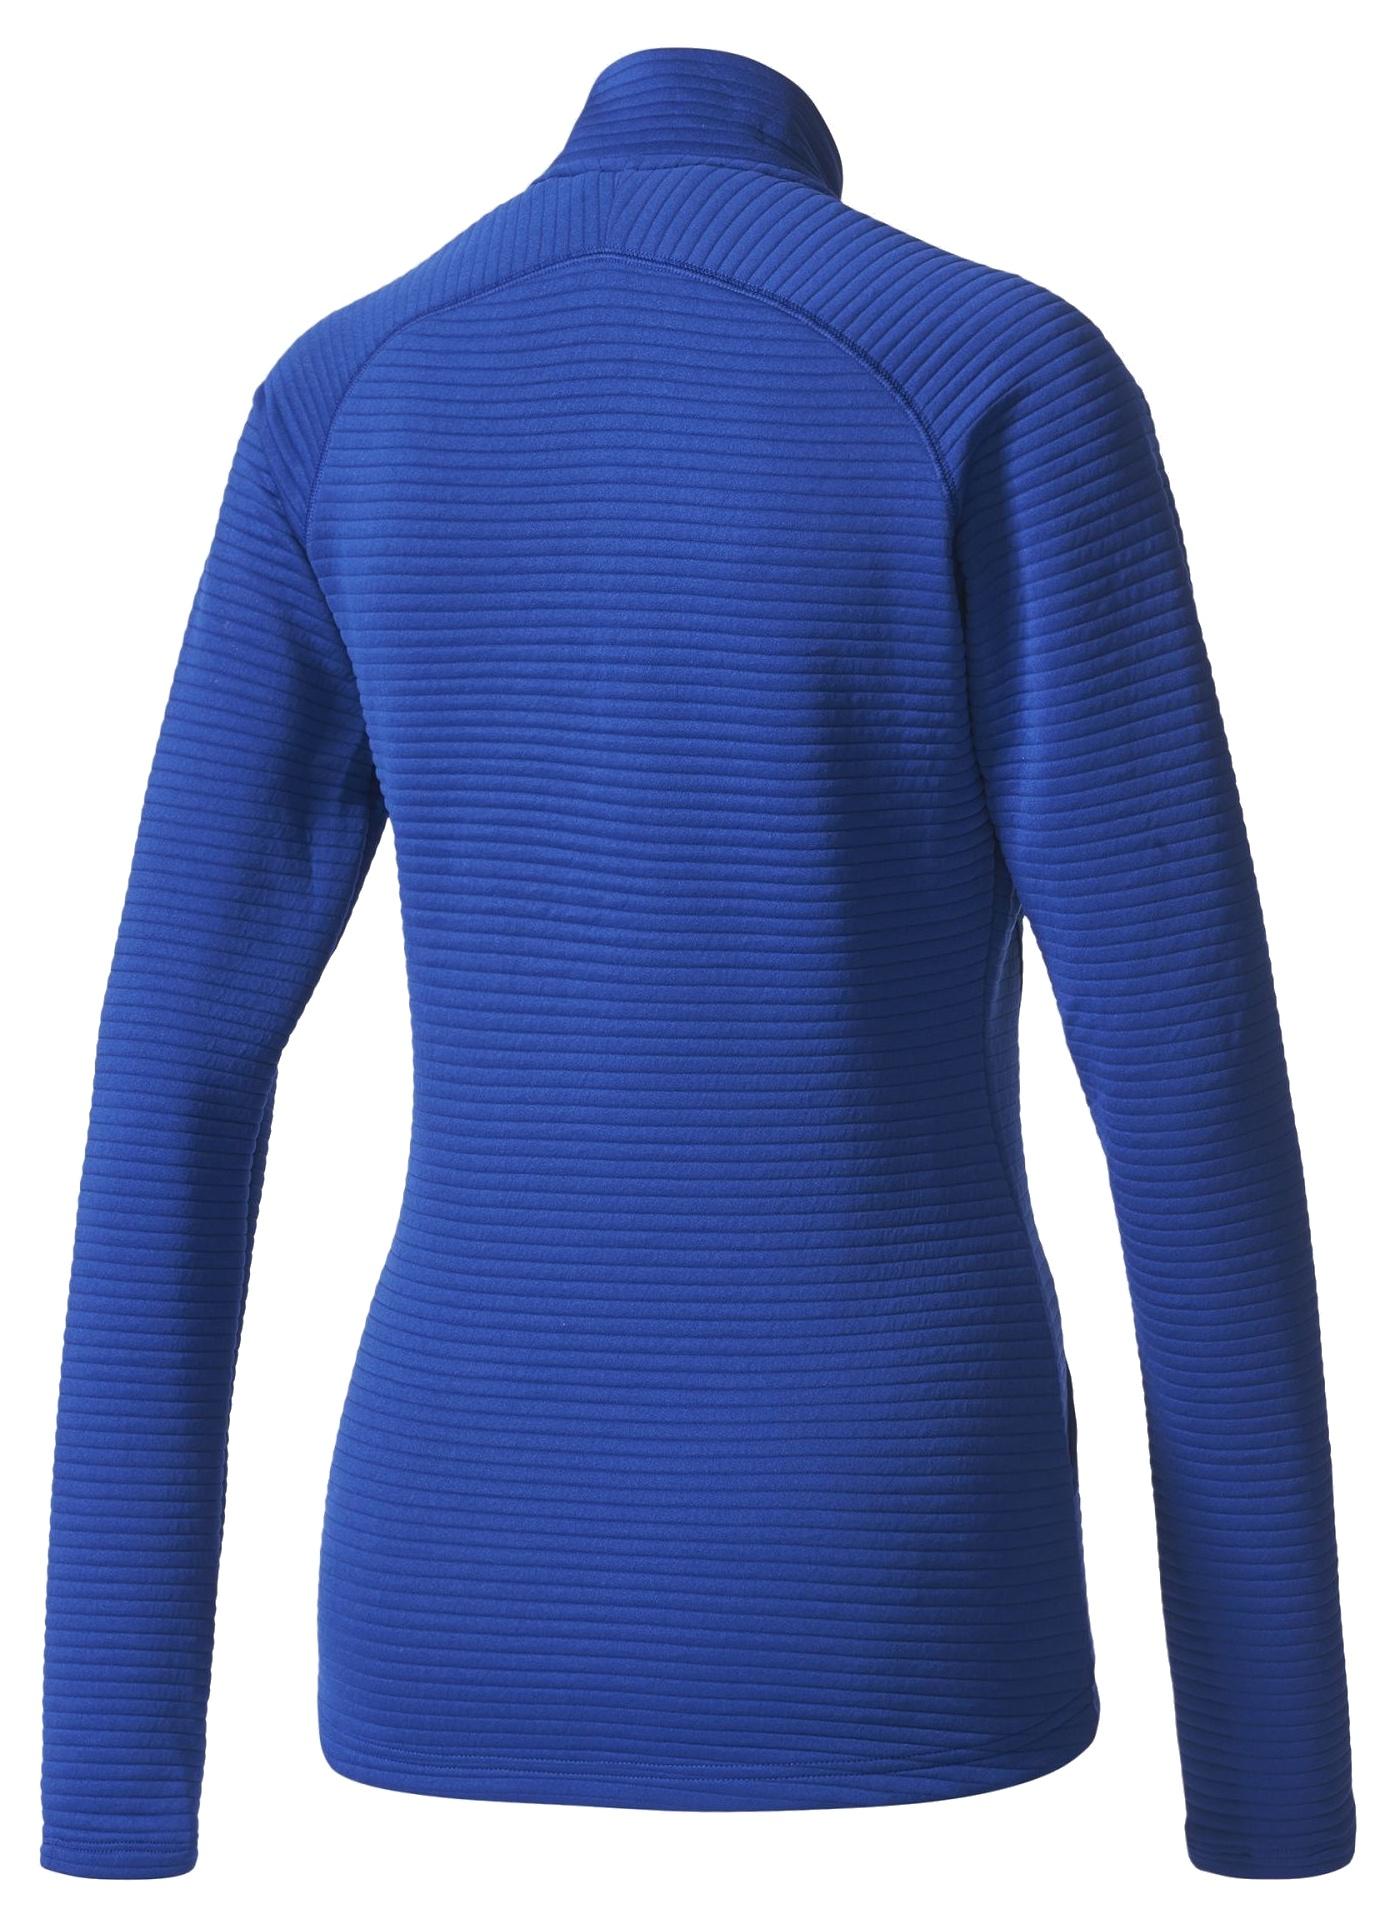 8c79e35b3c7 adidas Essentials golf vest 3-stripes dames blauw - Internet ...